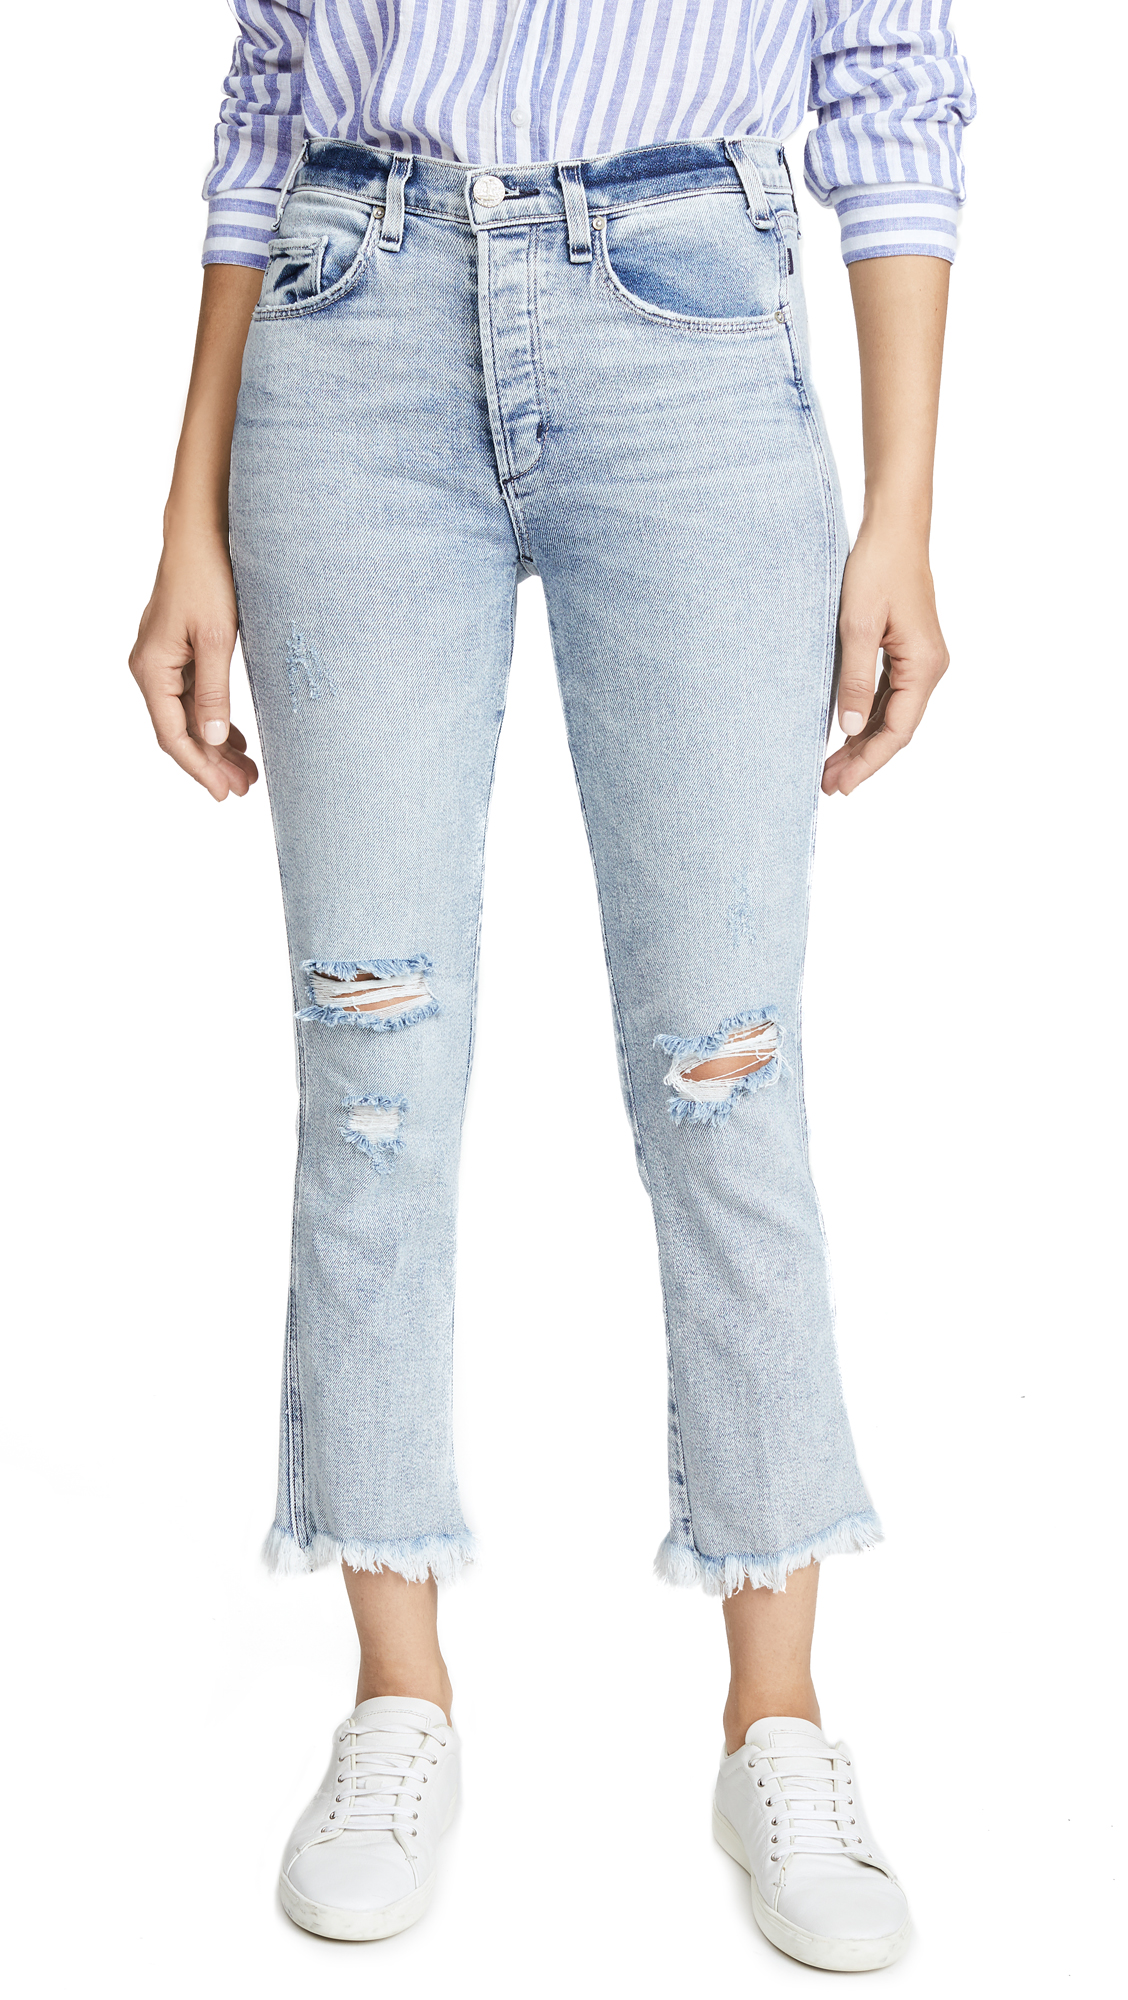 McGuire Denim High Rise Cropped Valletta Jeans